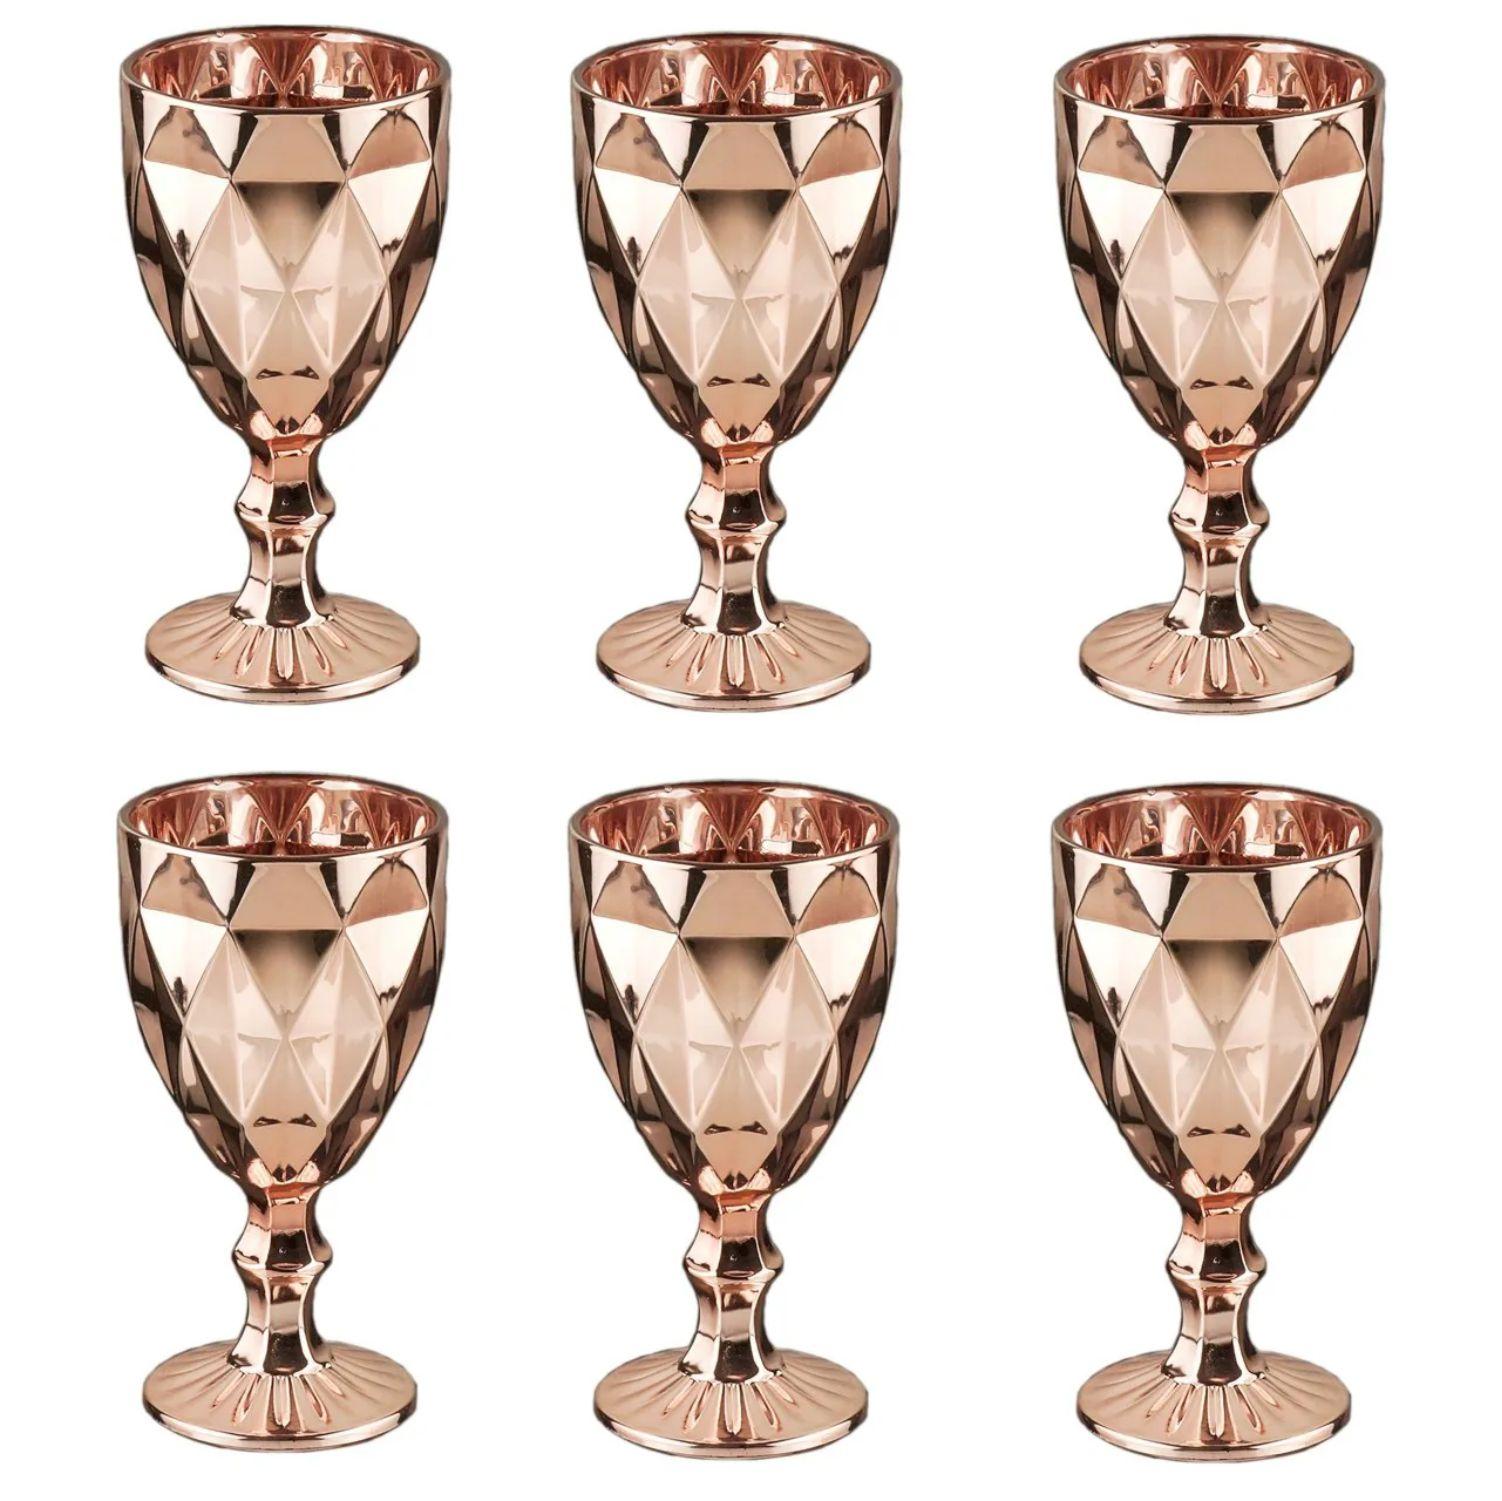 Jogo de 6 Taças Água de Vidro Diamond Rosé Golden 325ml - Lyor